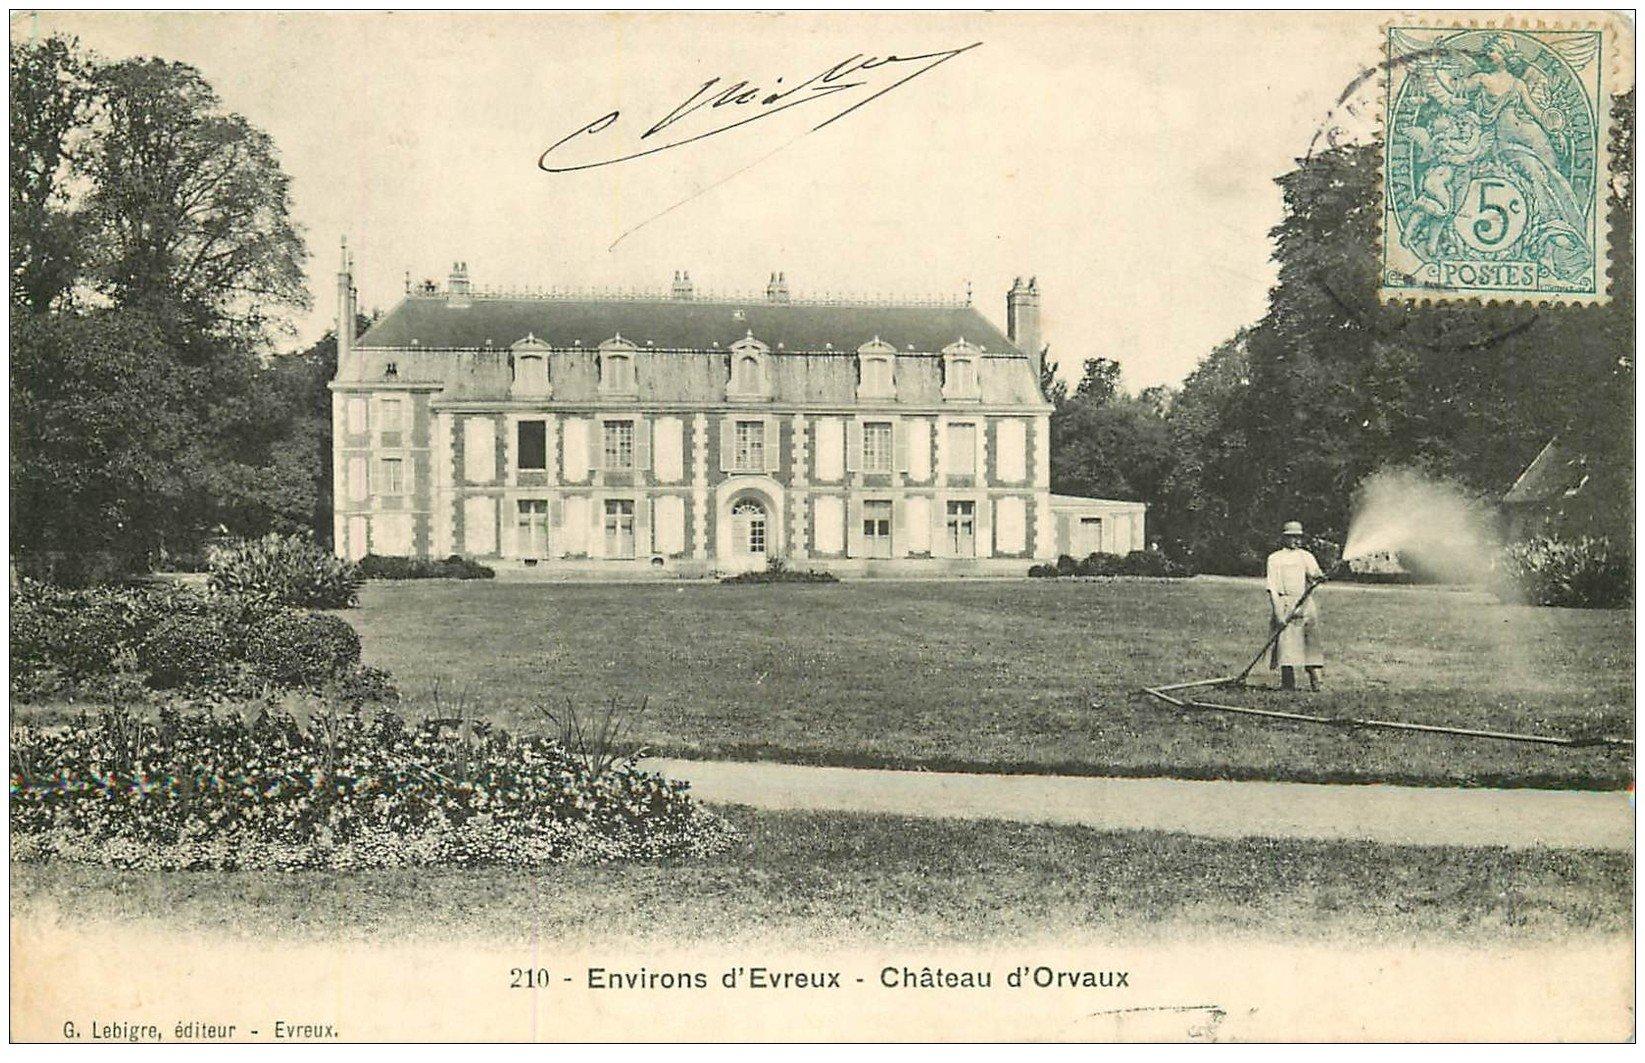 27 chateau d 39 orvaux jardinier pr s d 39 evreux 1907. Black Bedroom Furniture Sets. Home Design Ideas